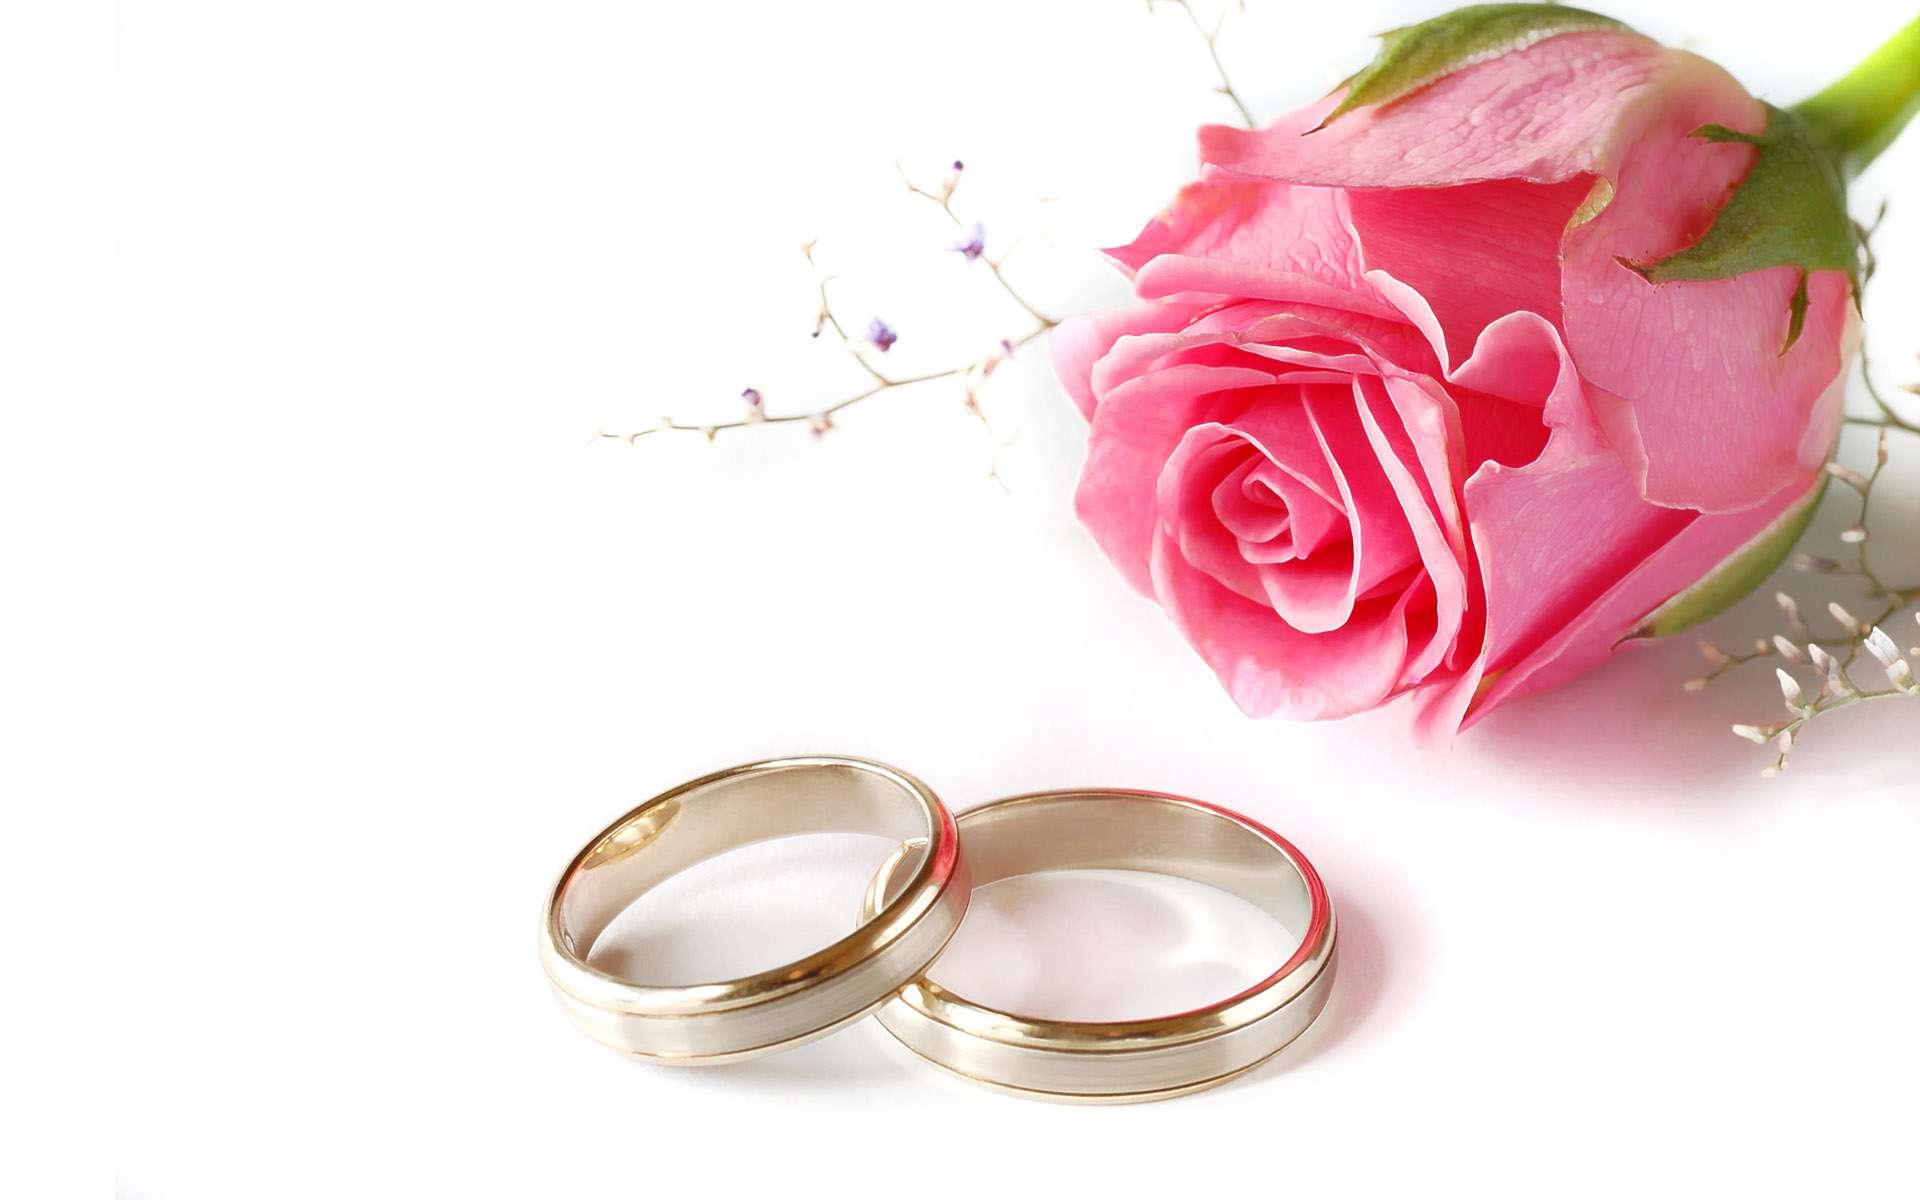 Christian wedding background